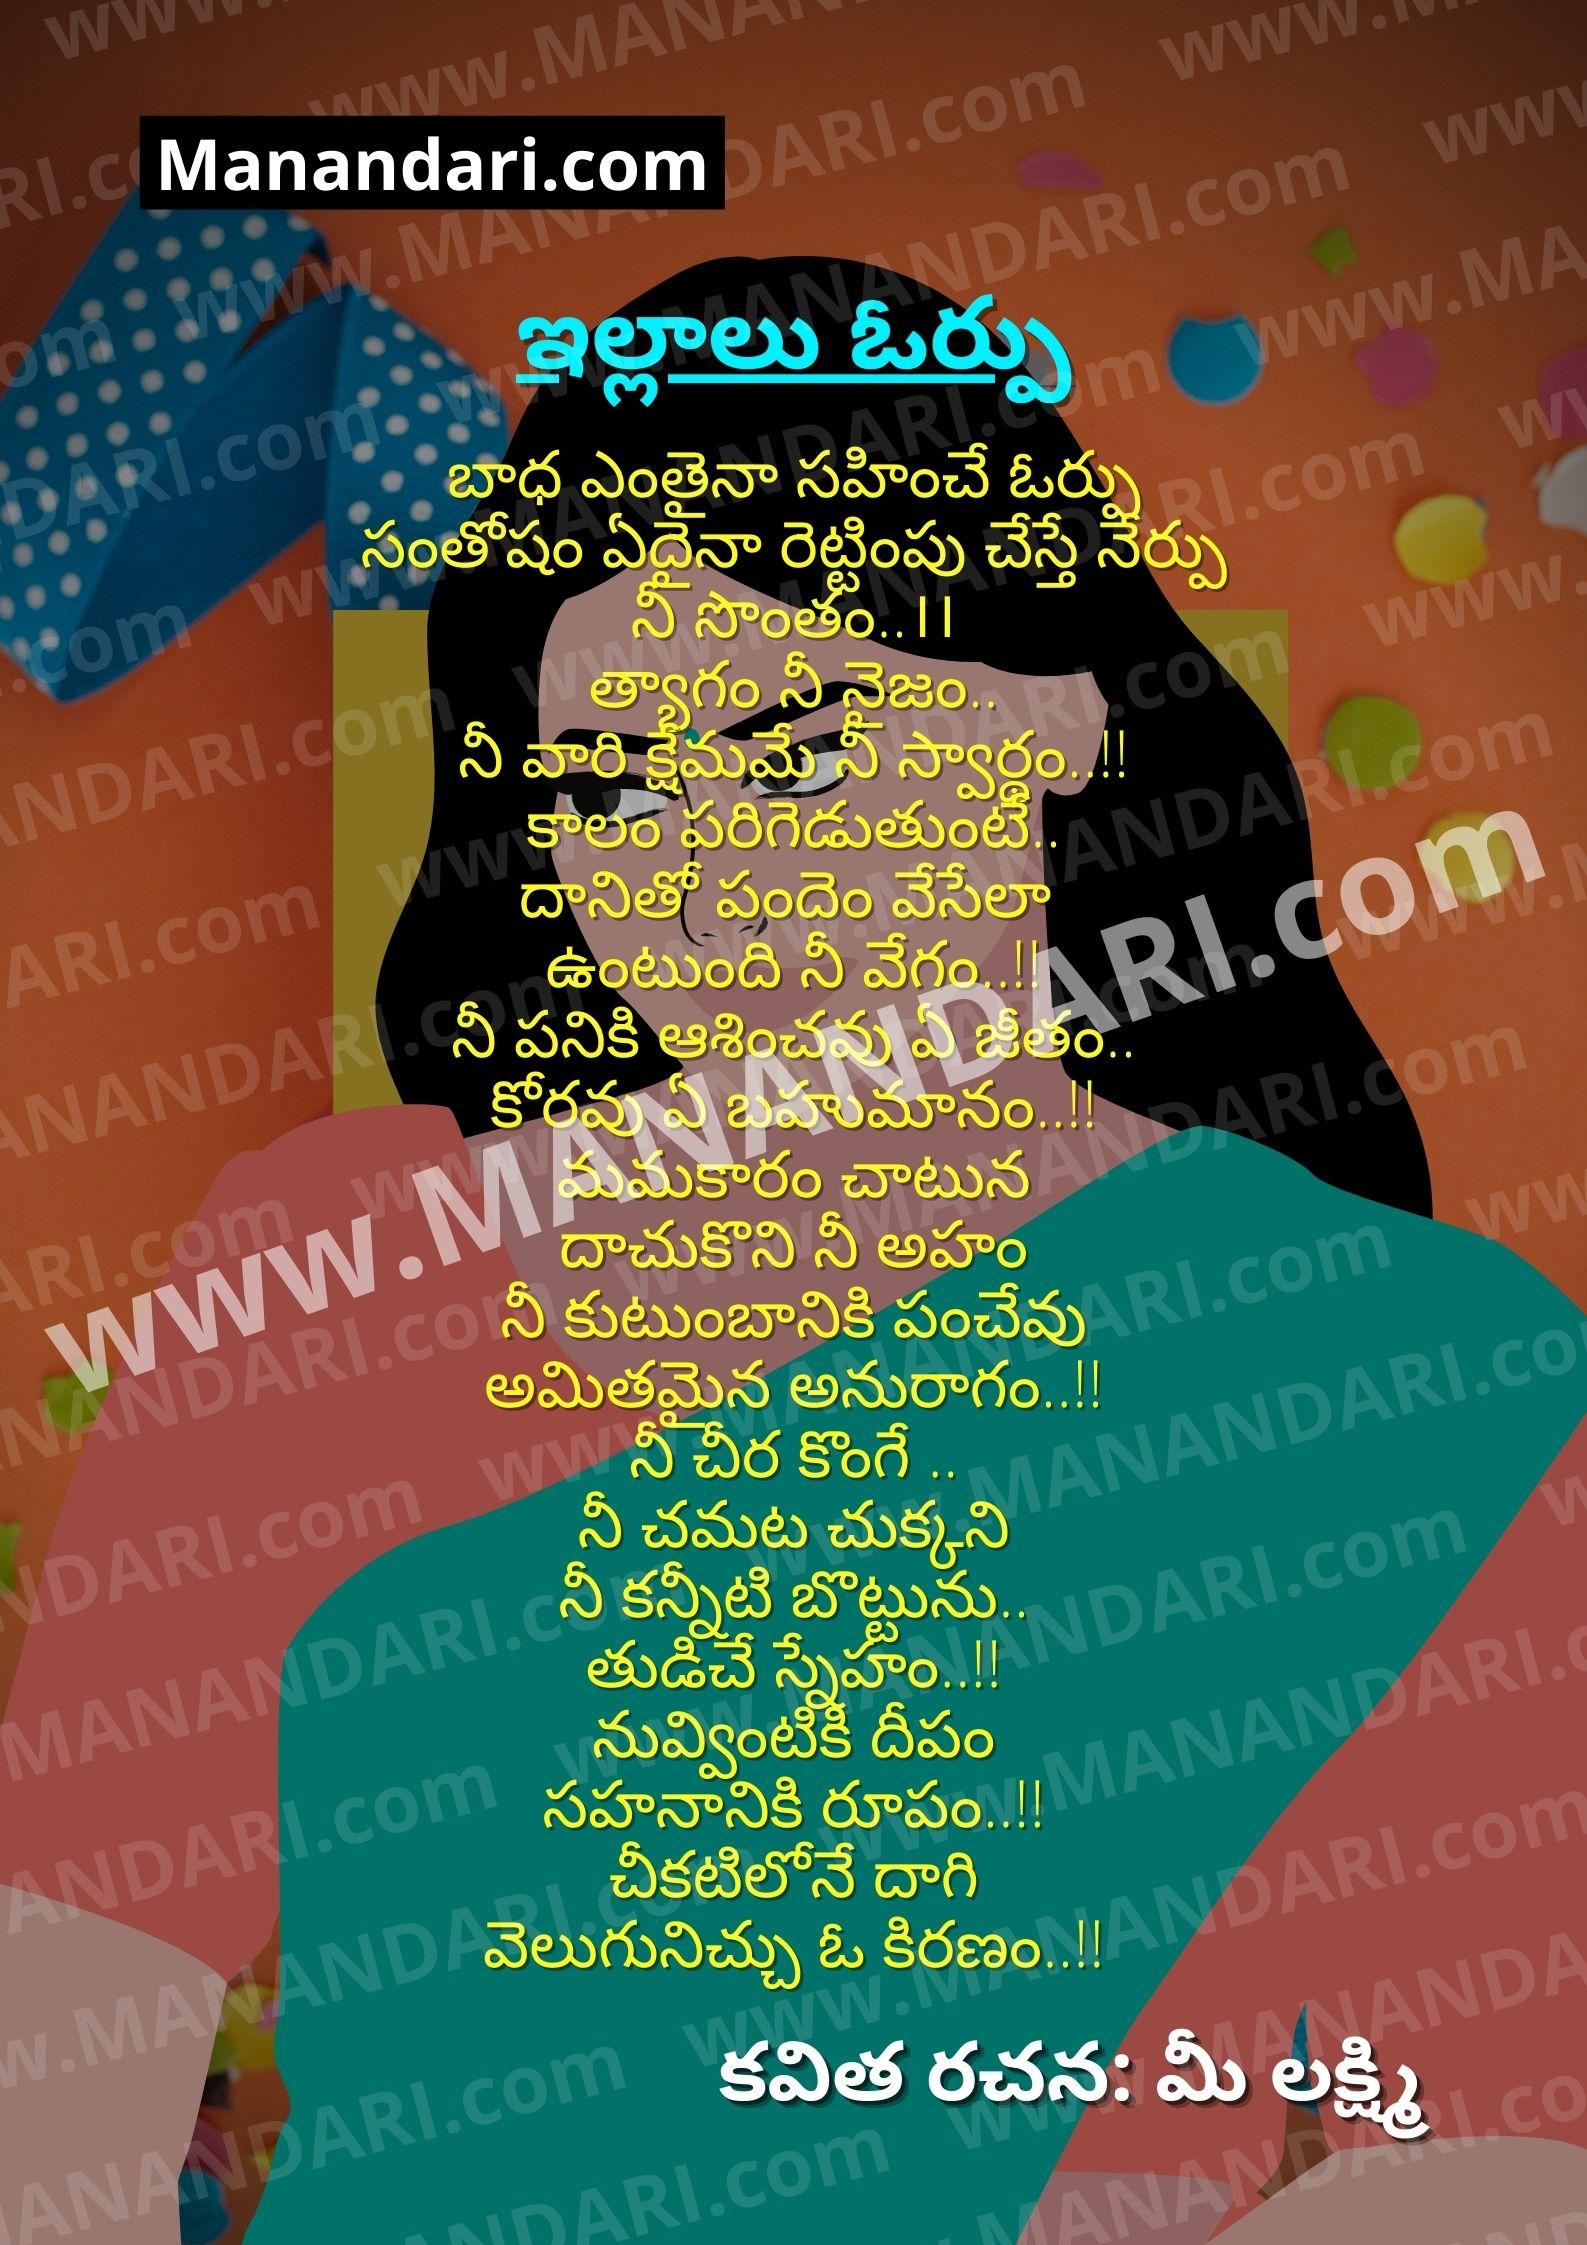 Illaali orpu kavita by Mee lakshmi